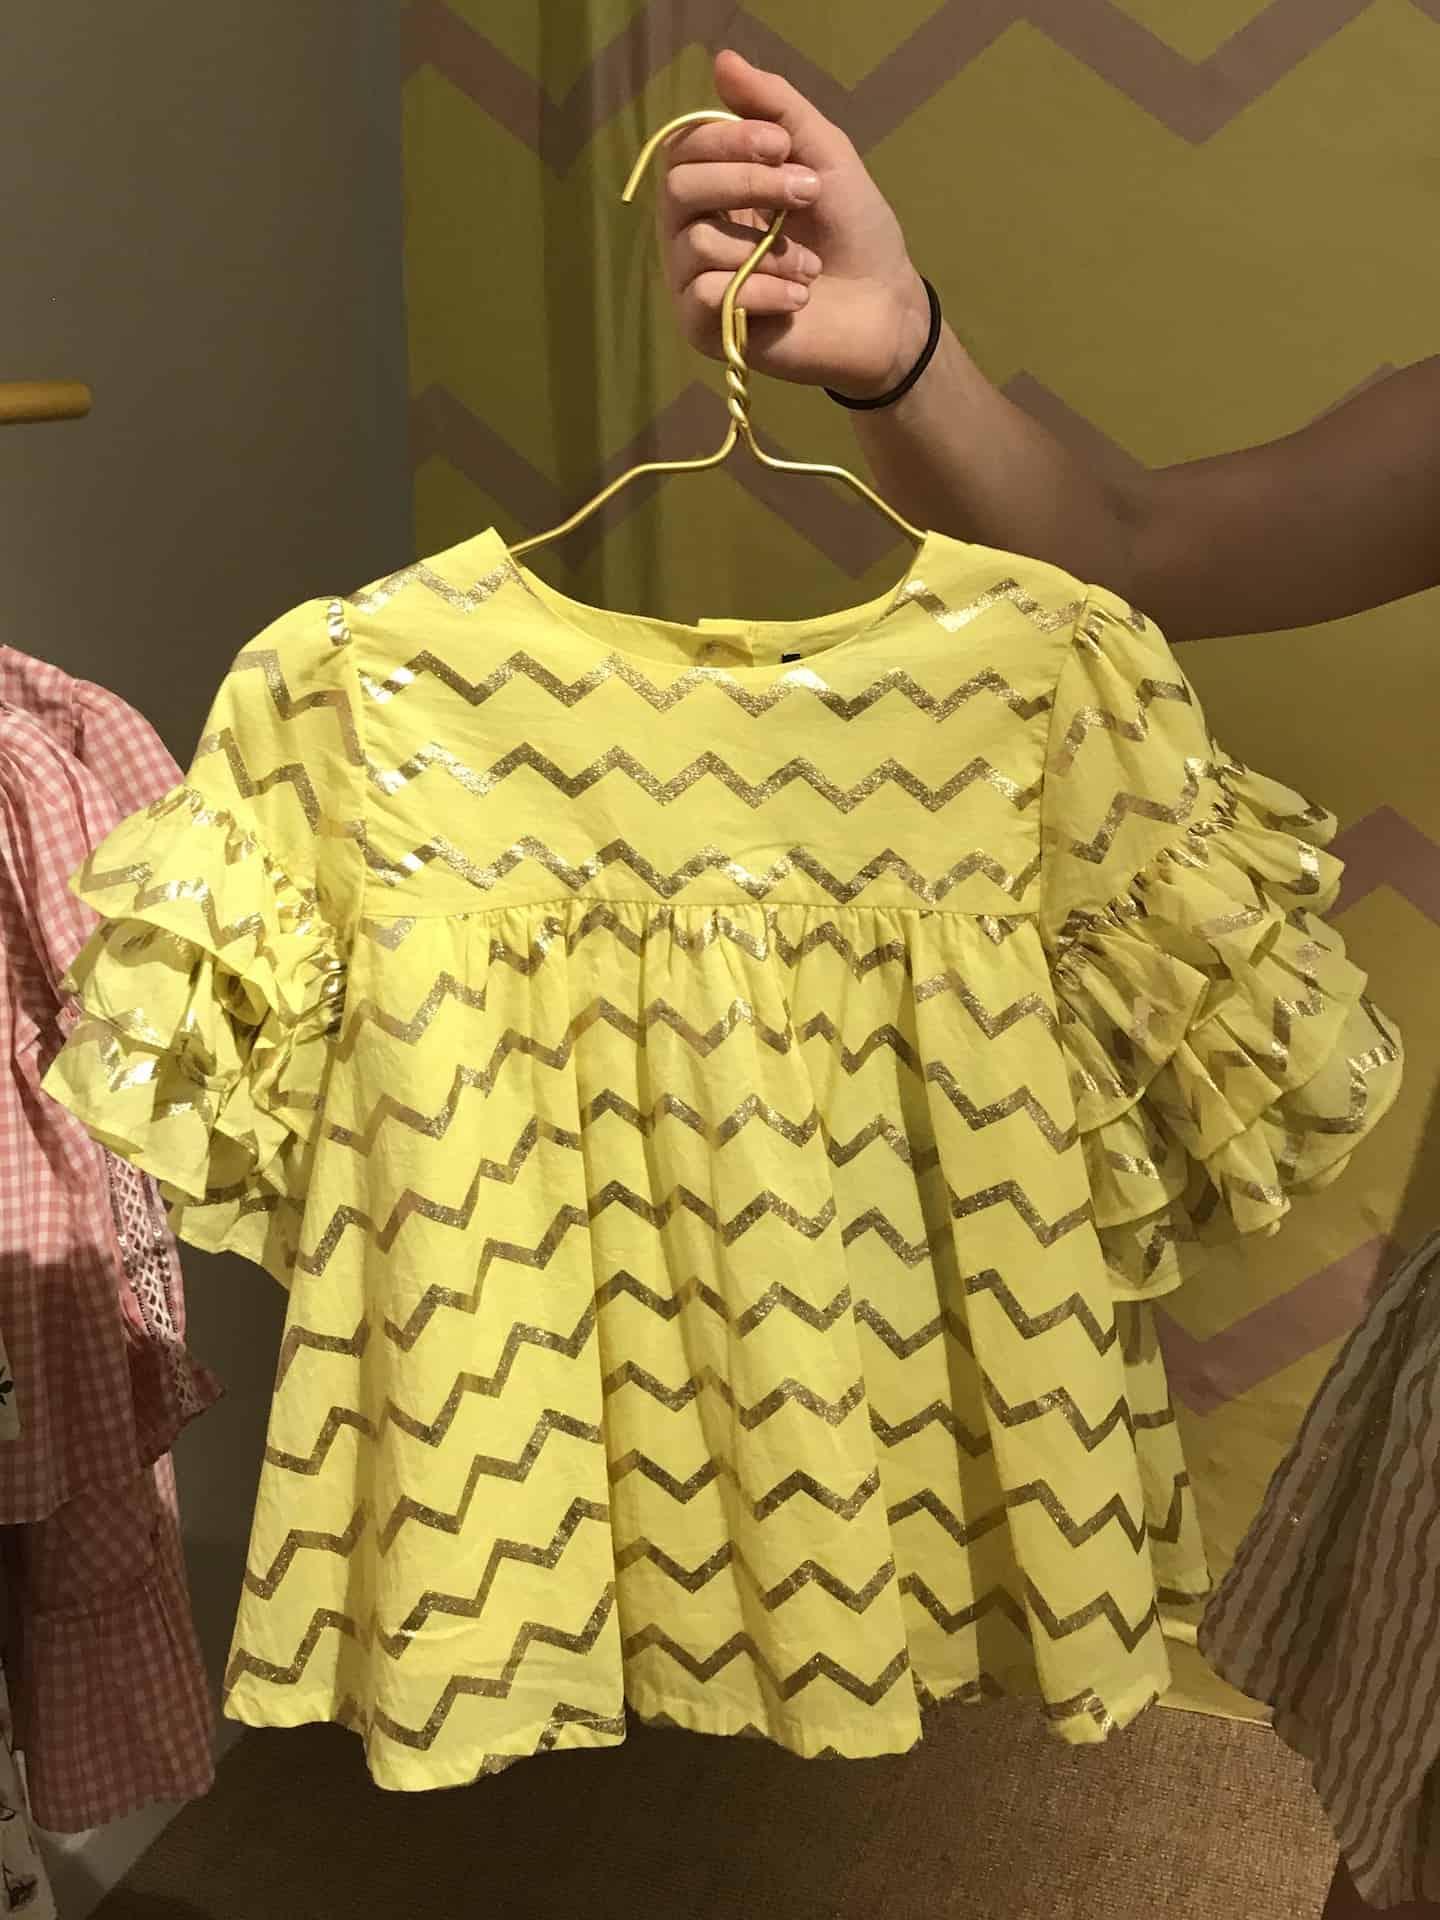 Velveteen SS20 kids fashion collection at Pitti Bimbo 89